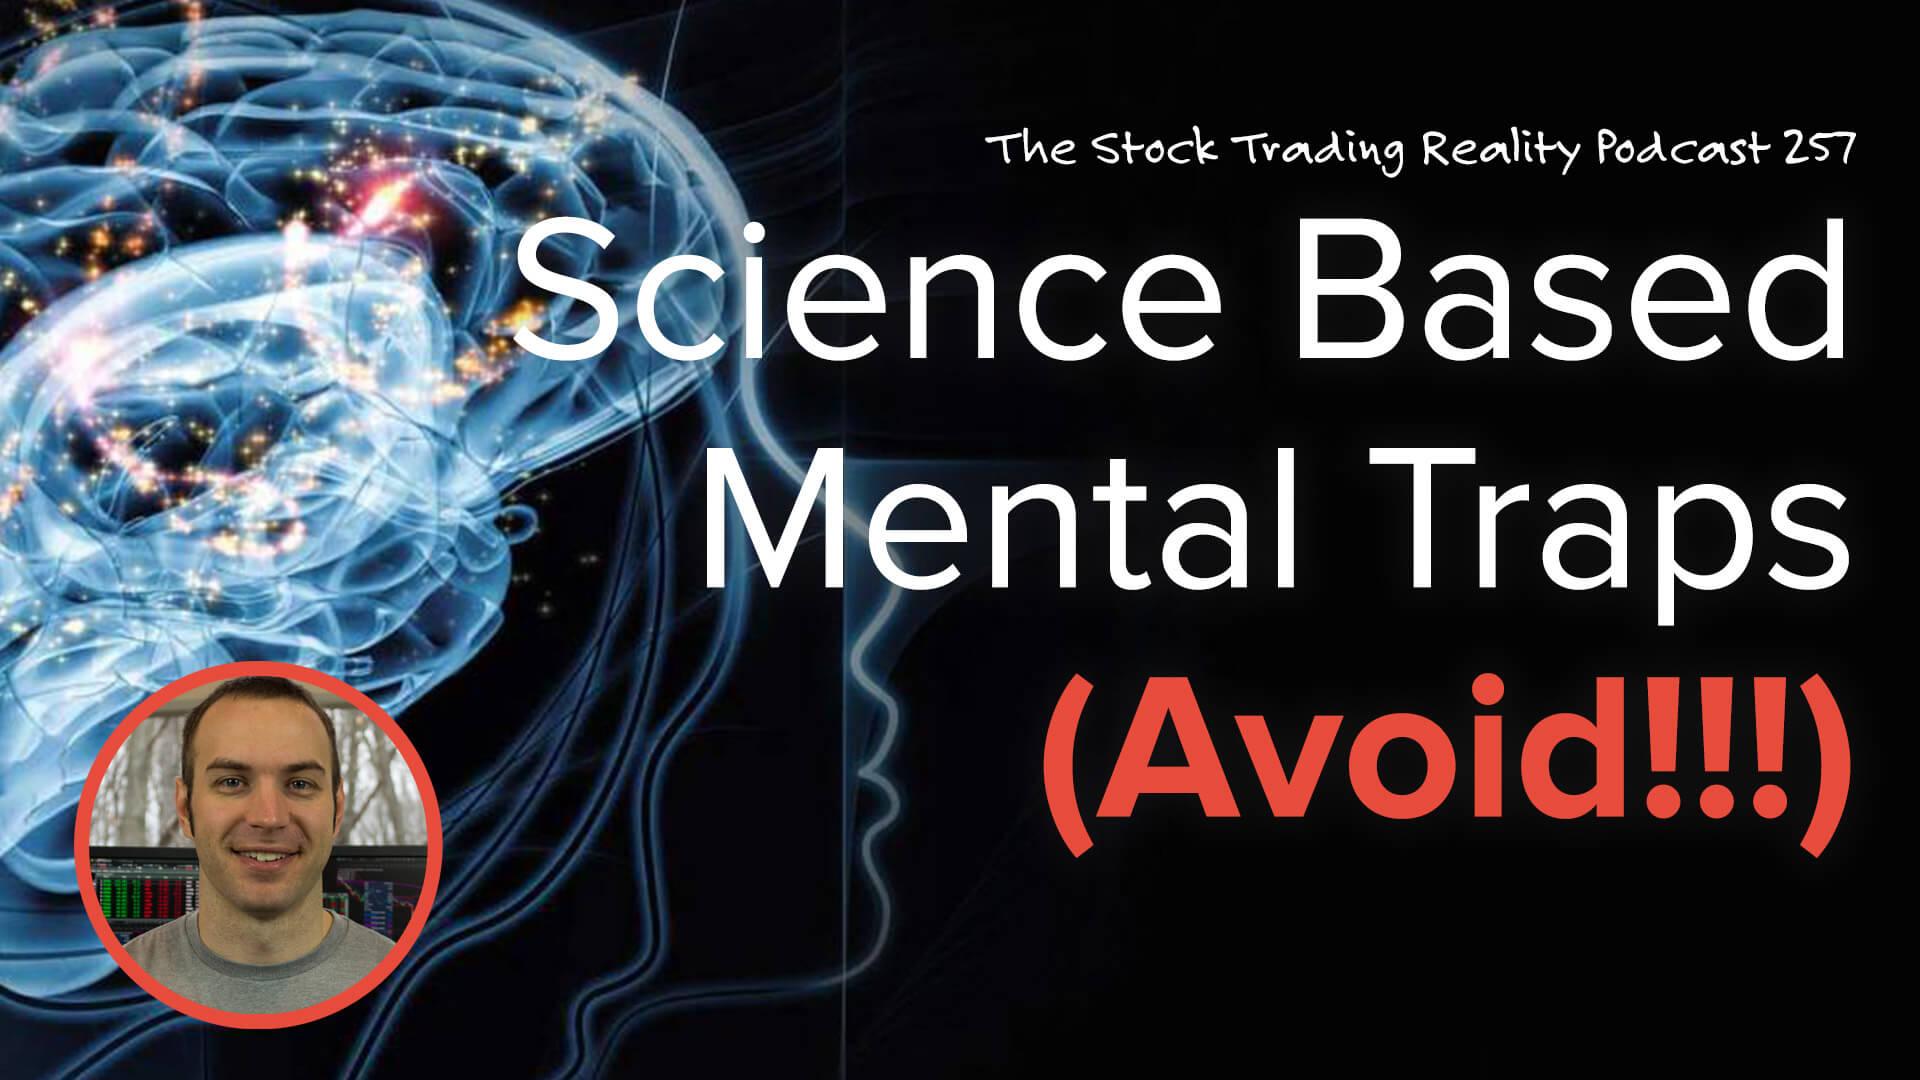 STR 257: Science Based Mental Traps (Avoid!!!)